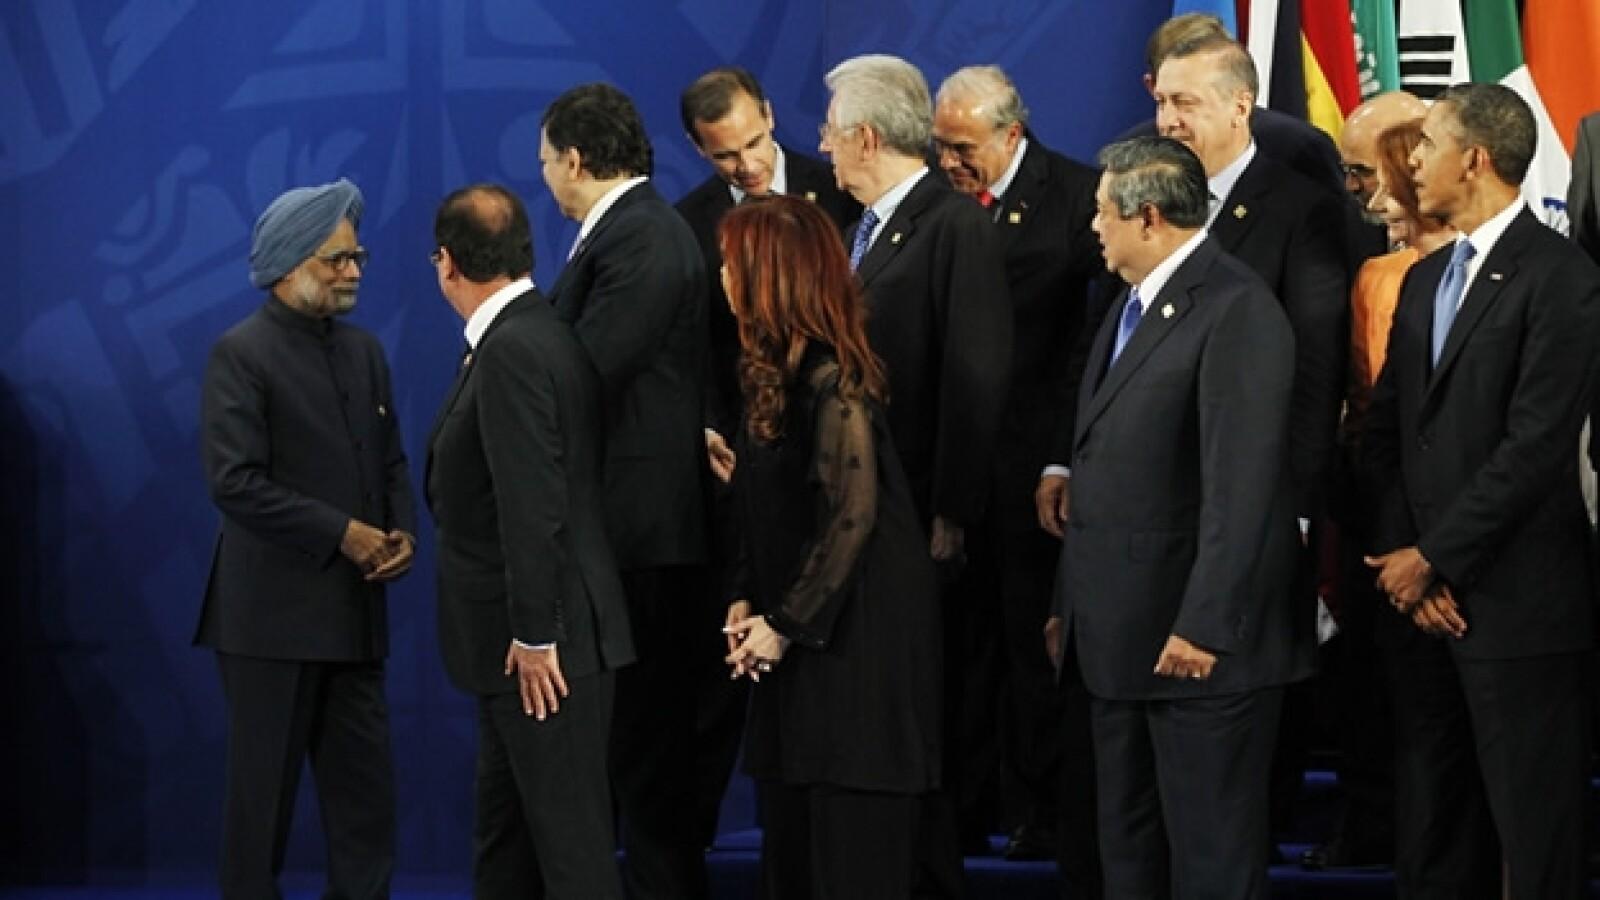 obama, cristina, los cabos